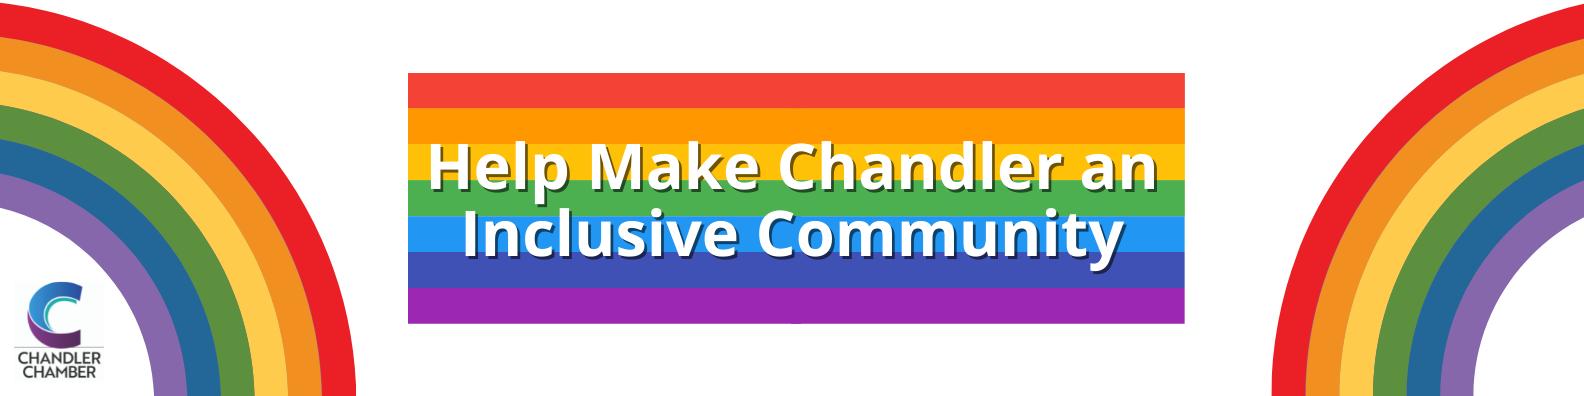 Help Make Chandler an Inclusive Community (1)